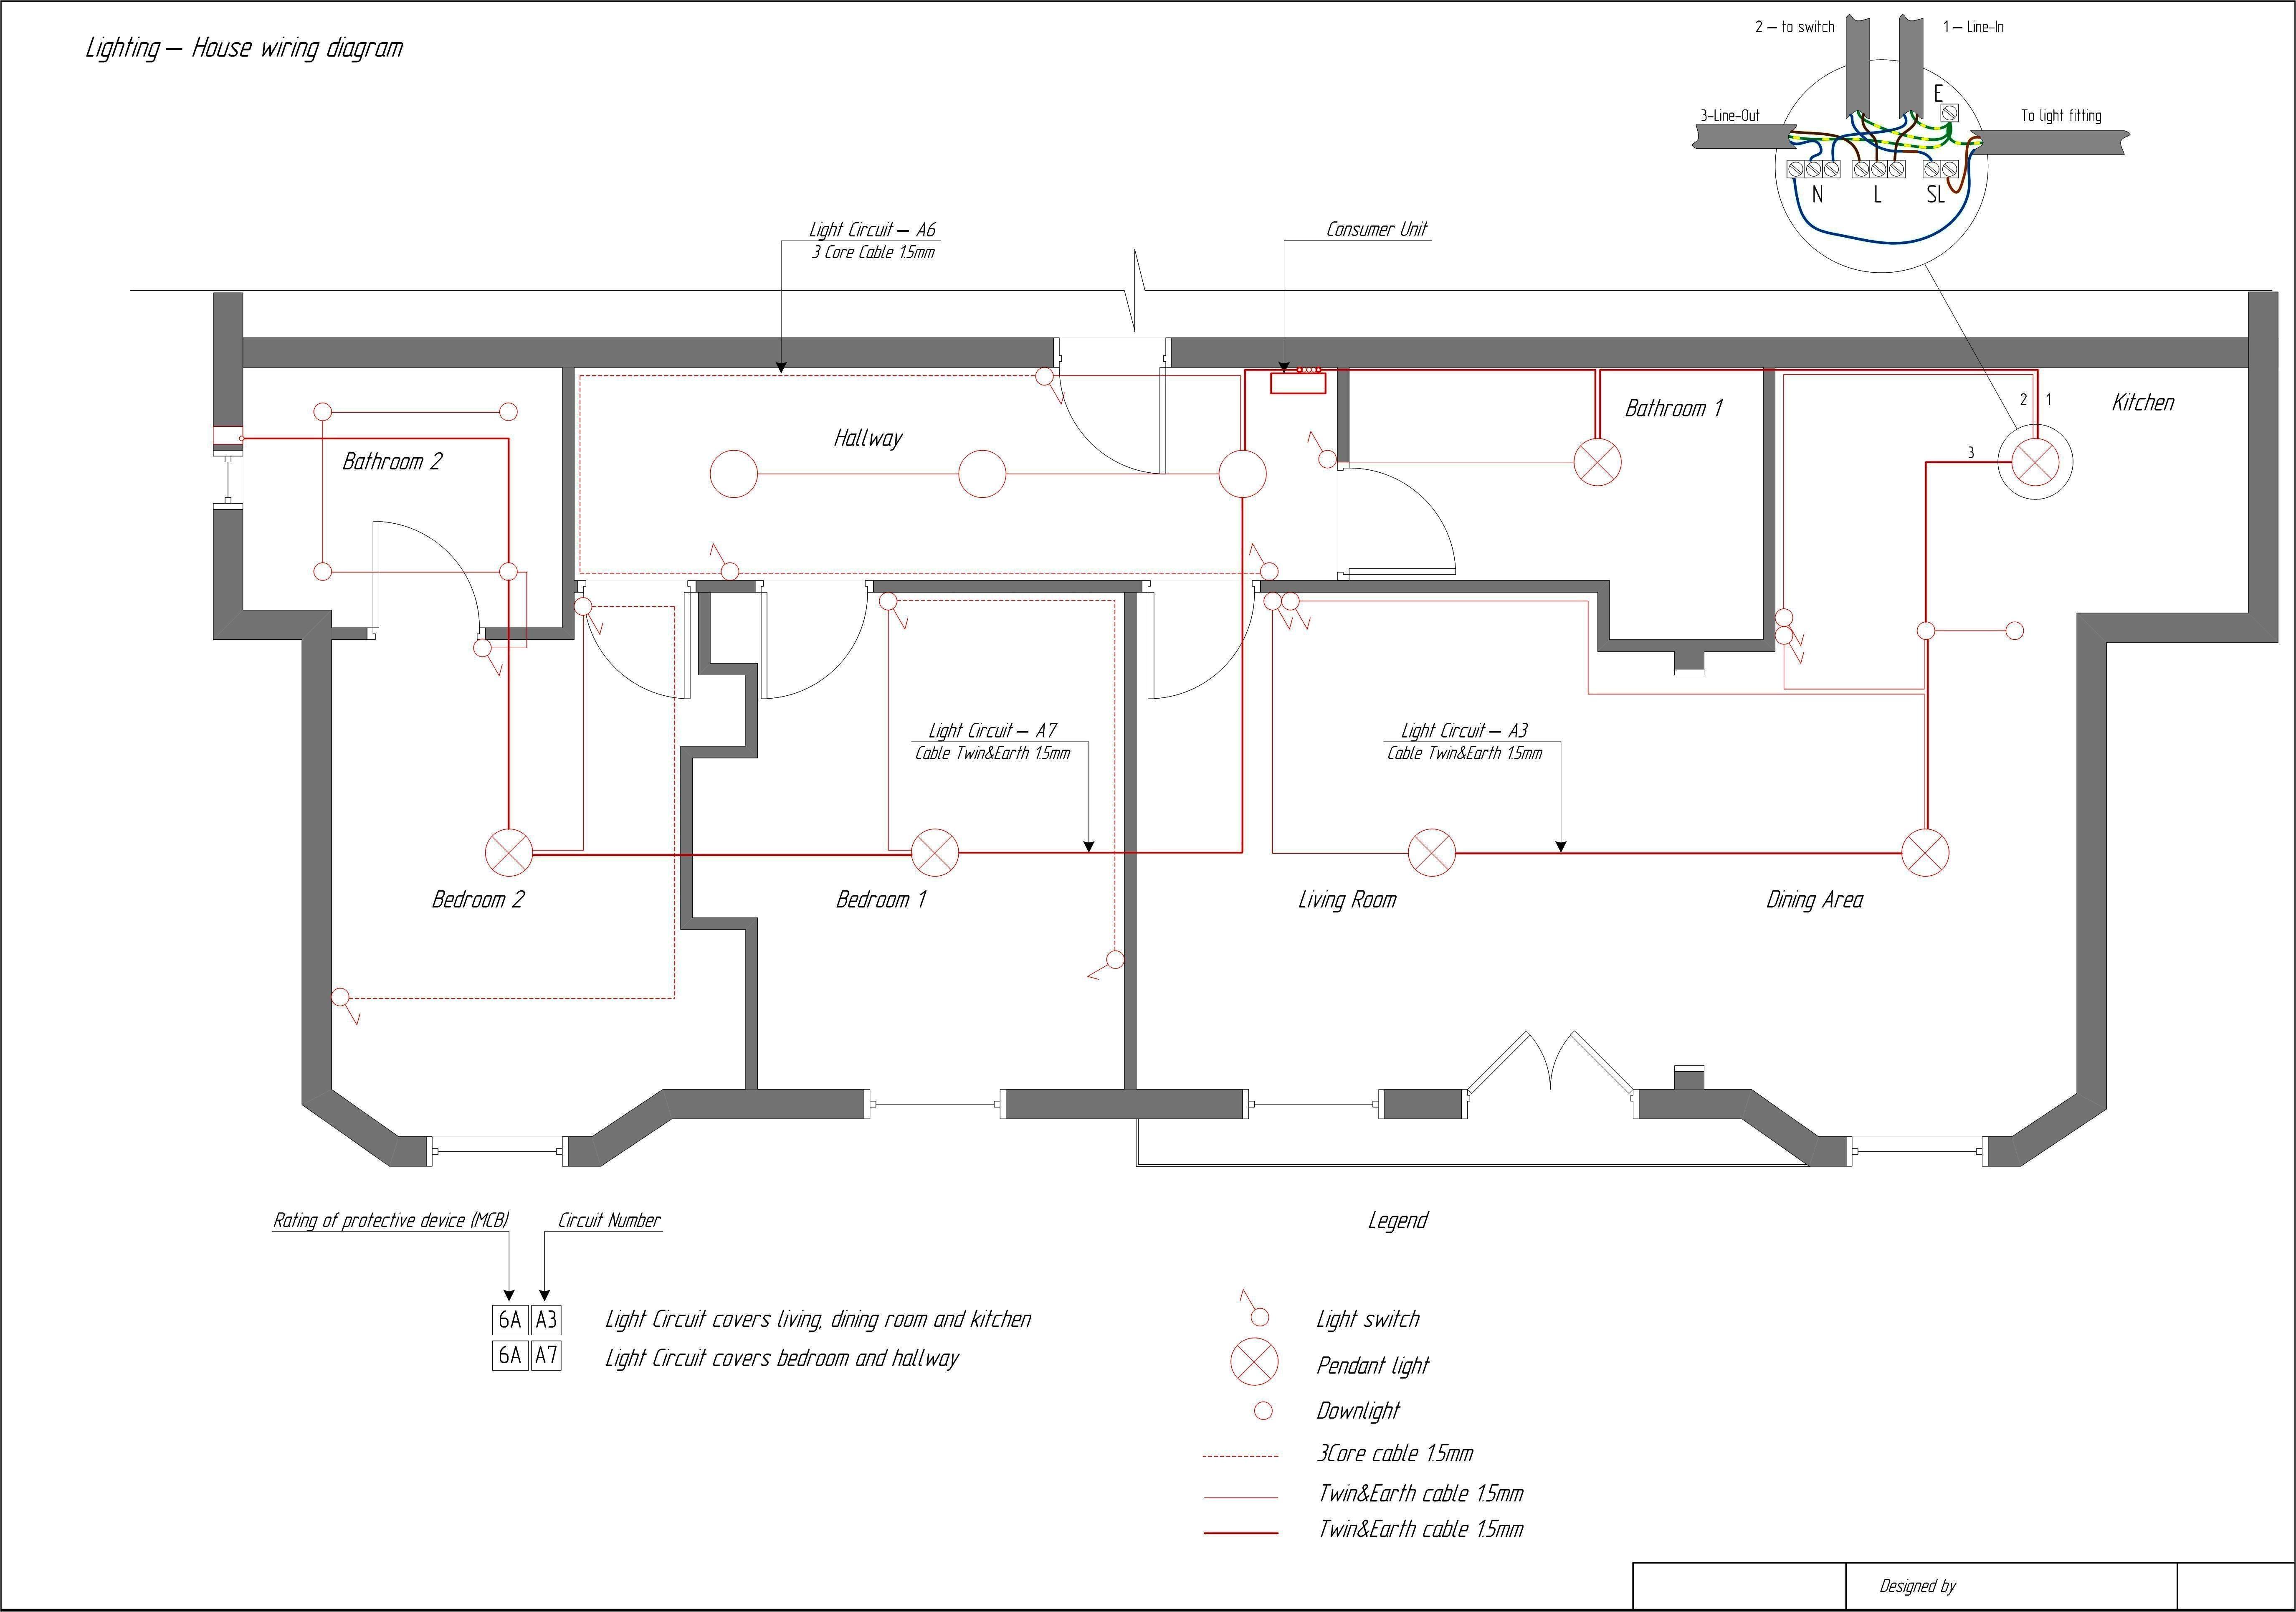 Electrical Wiring Diagram App Smtp Wiring Diagram Wiring Diagram Technic